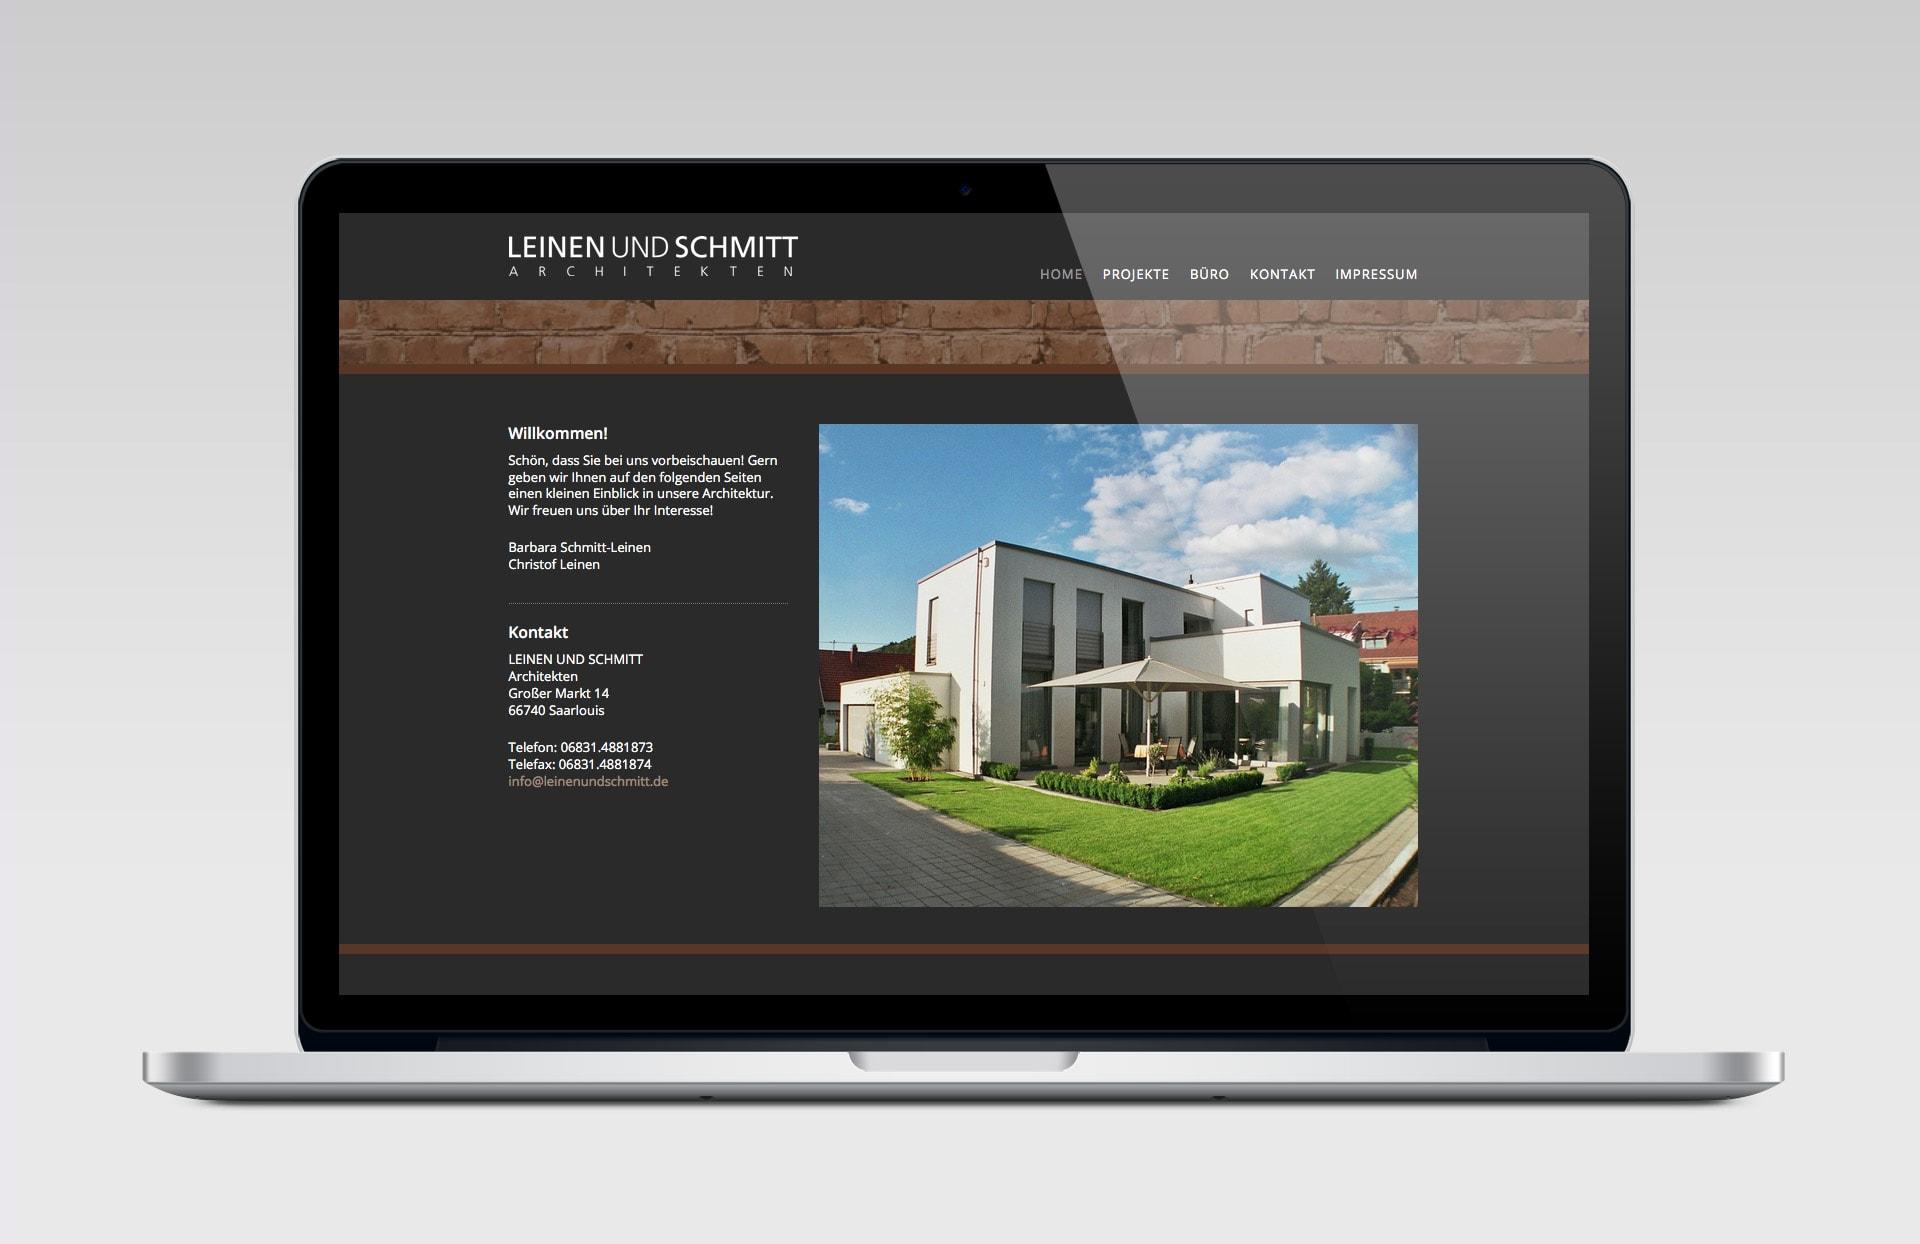 LEINEN UND SCHMITT GbR responsive Website